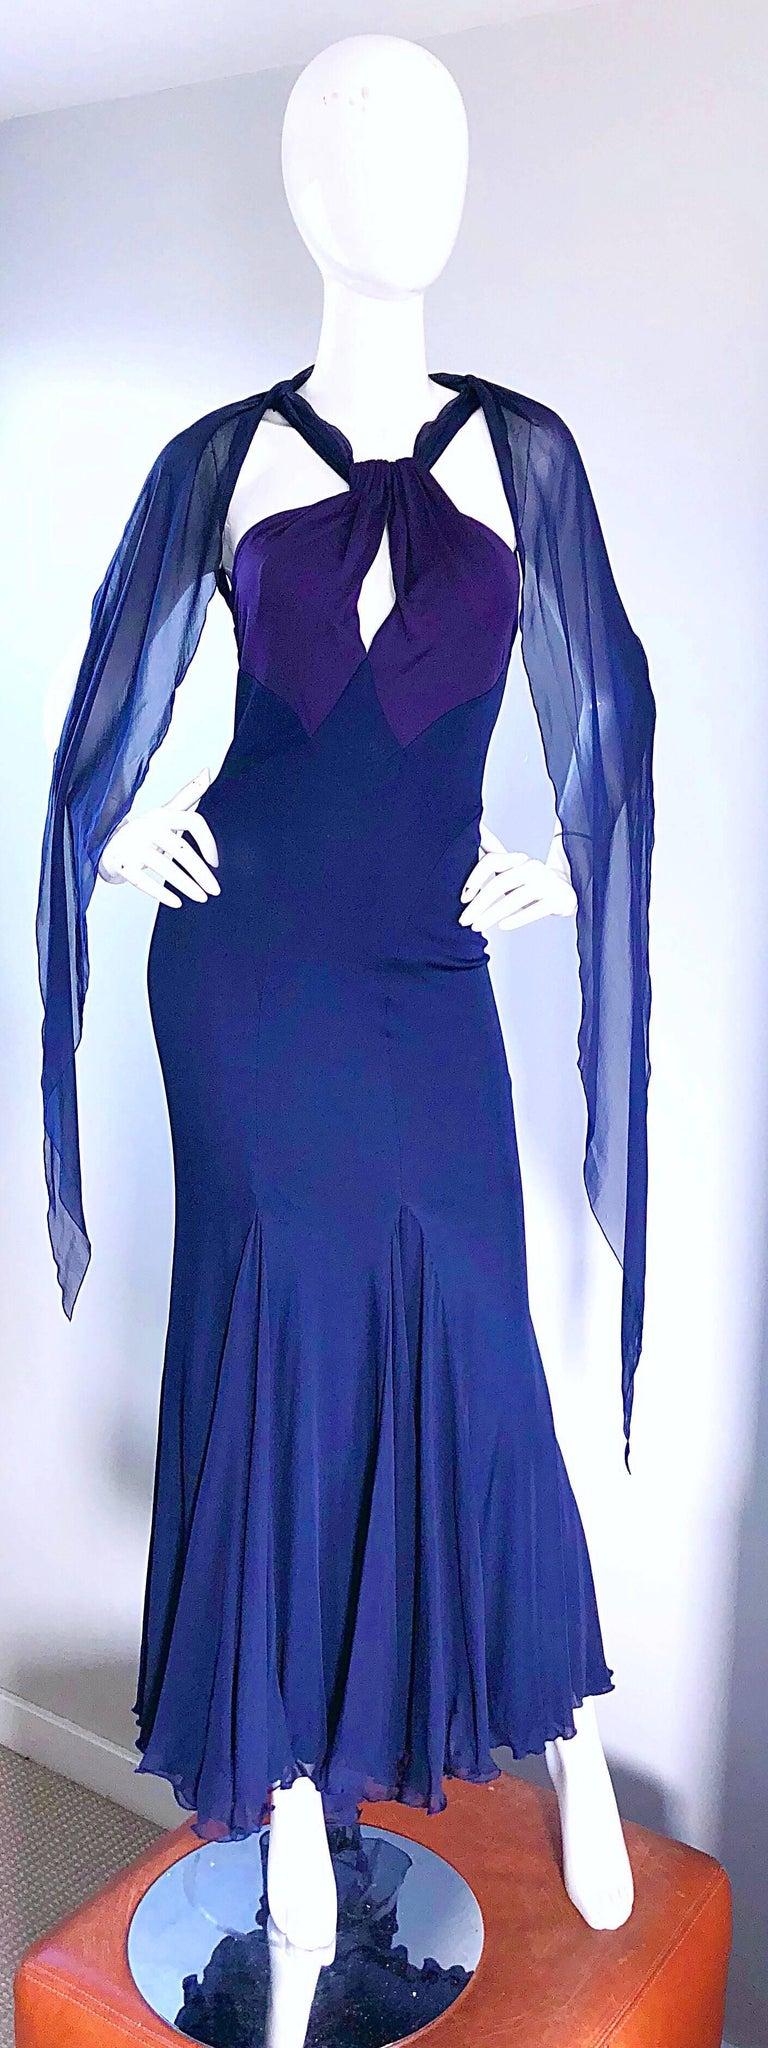 Bill Blass Vintage Silk Jersey and Chiffon Navy Blue Purple Grecian Evening Gown For Sale 3